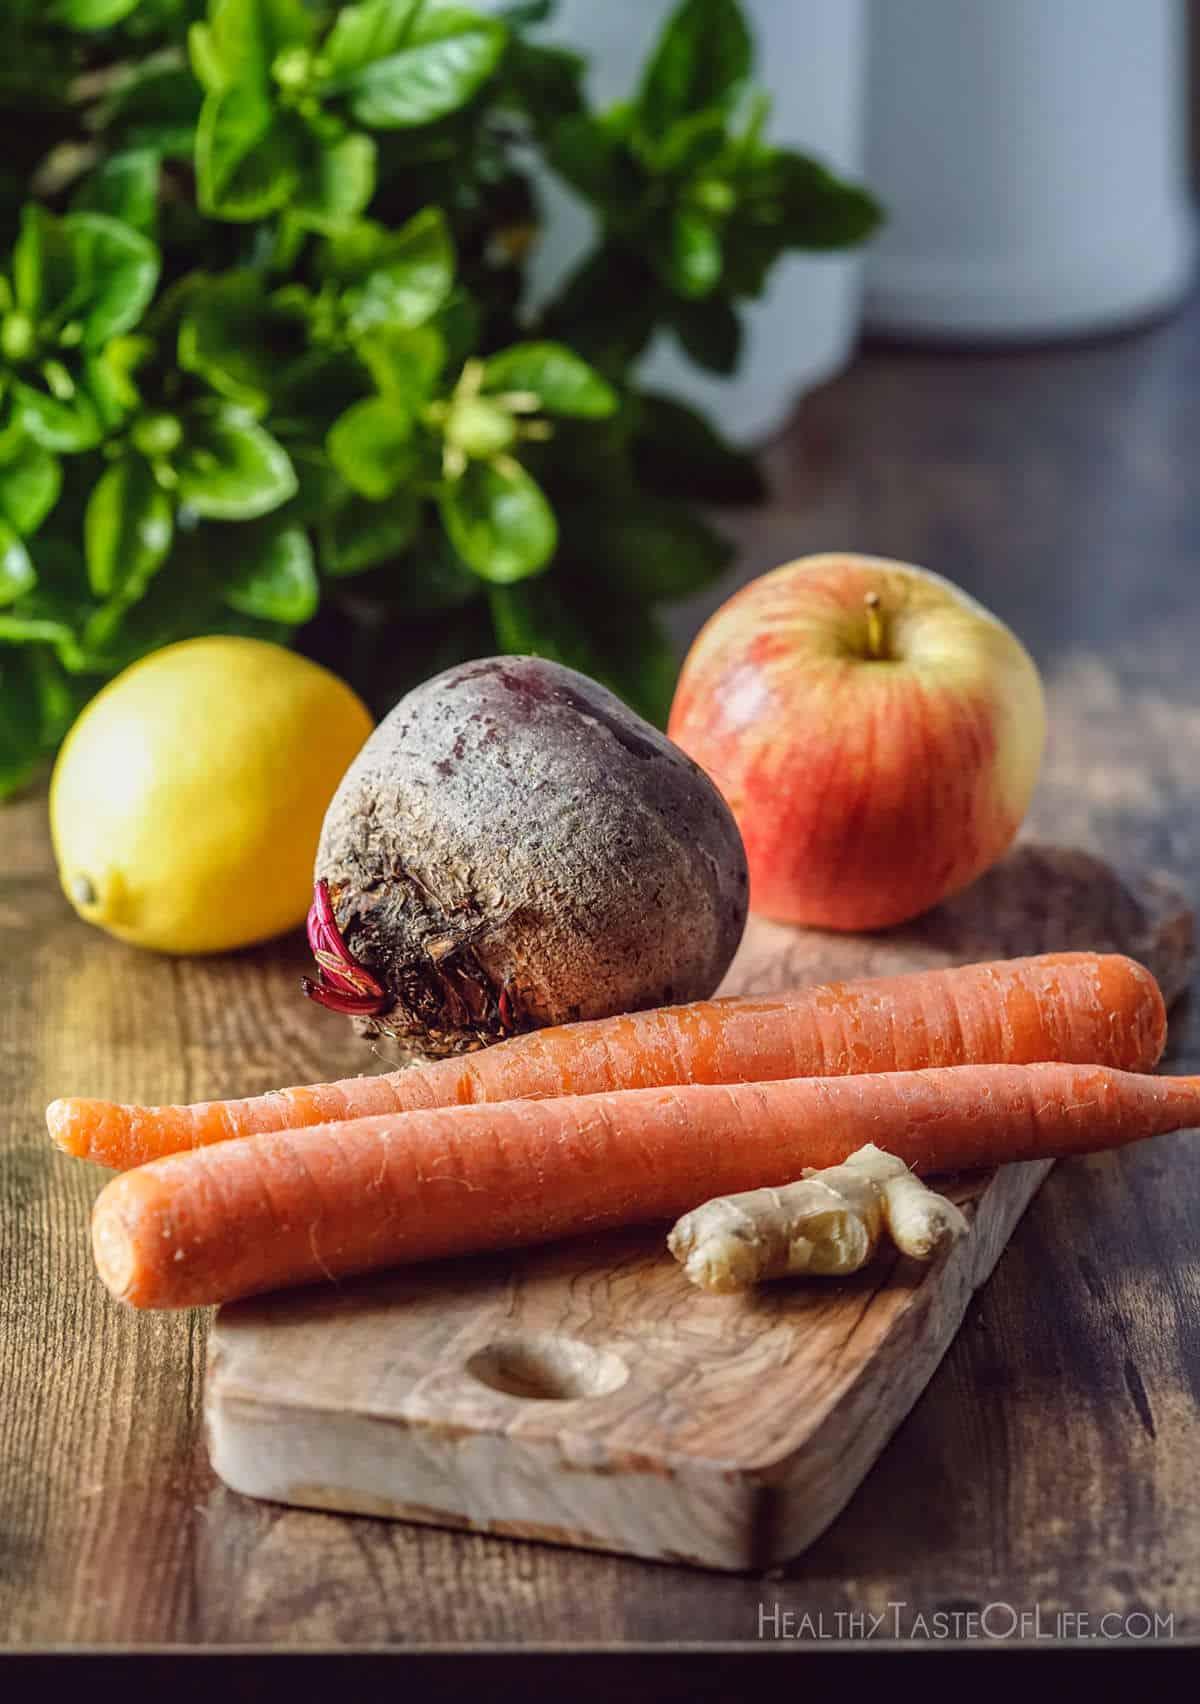 Whole beet carrots apple lemon ginger on prepared for juicing.